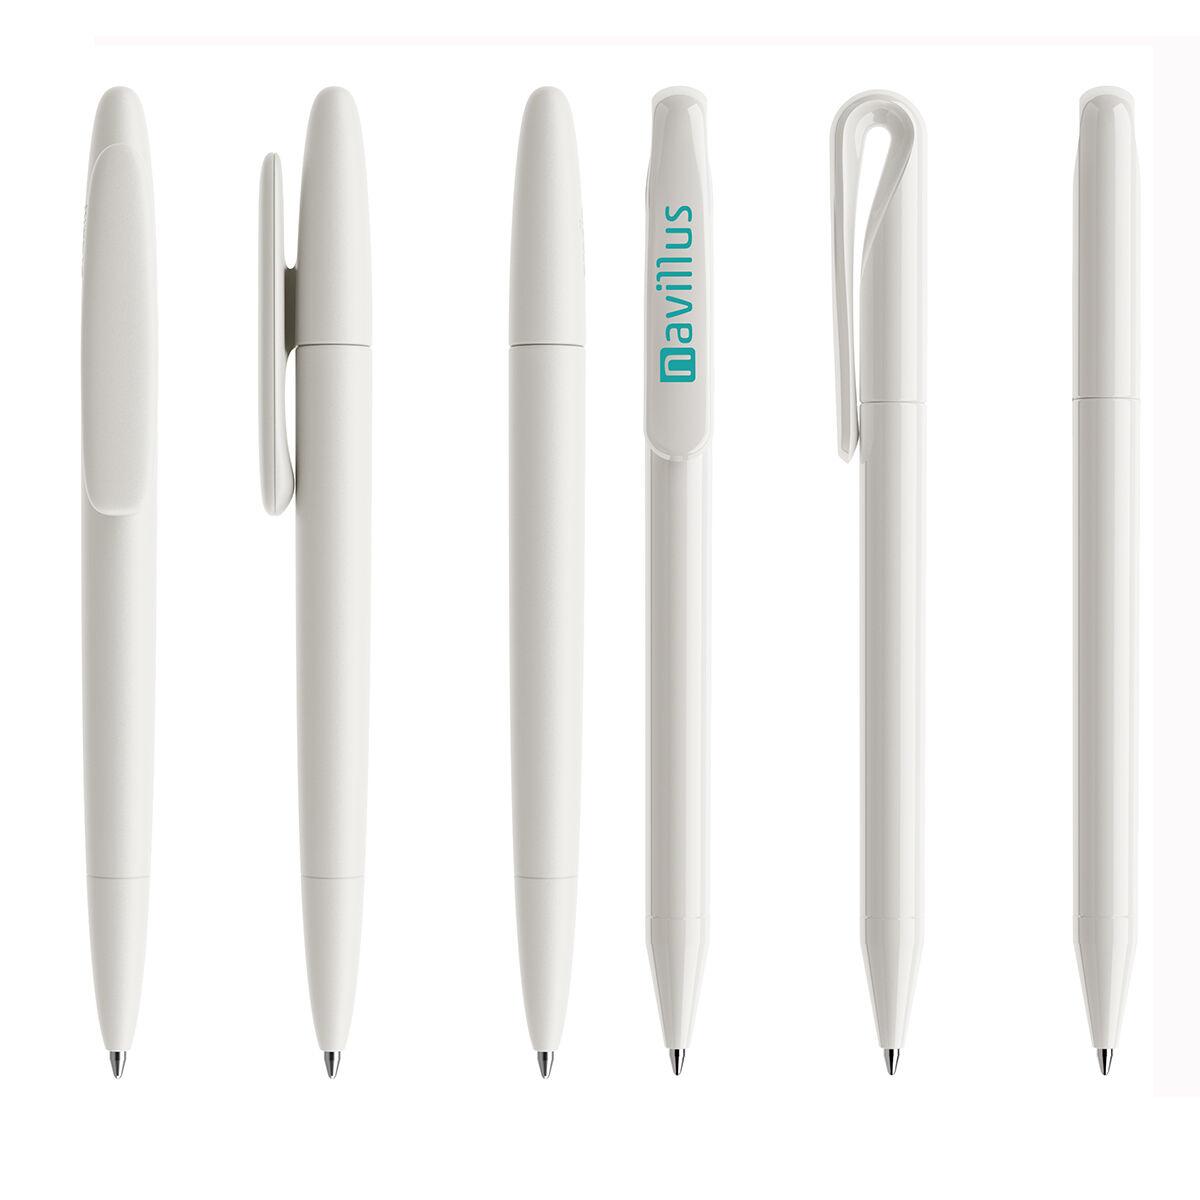 Prodir Antibacterial White Promotional Pens